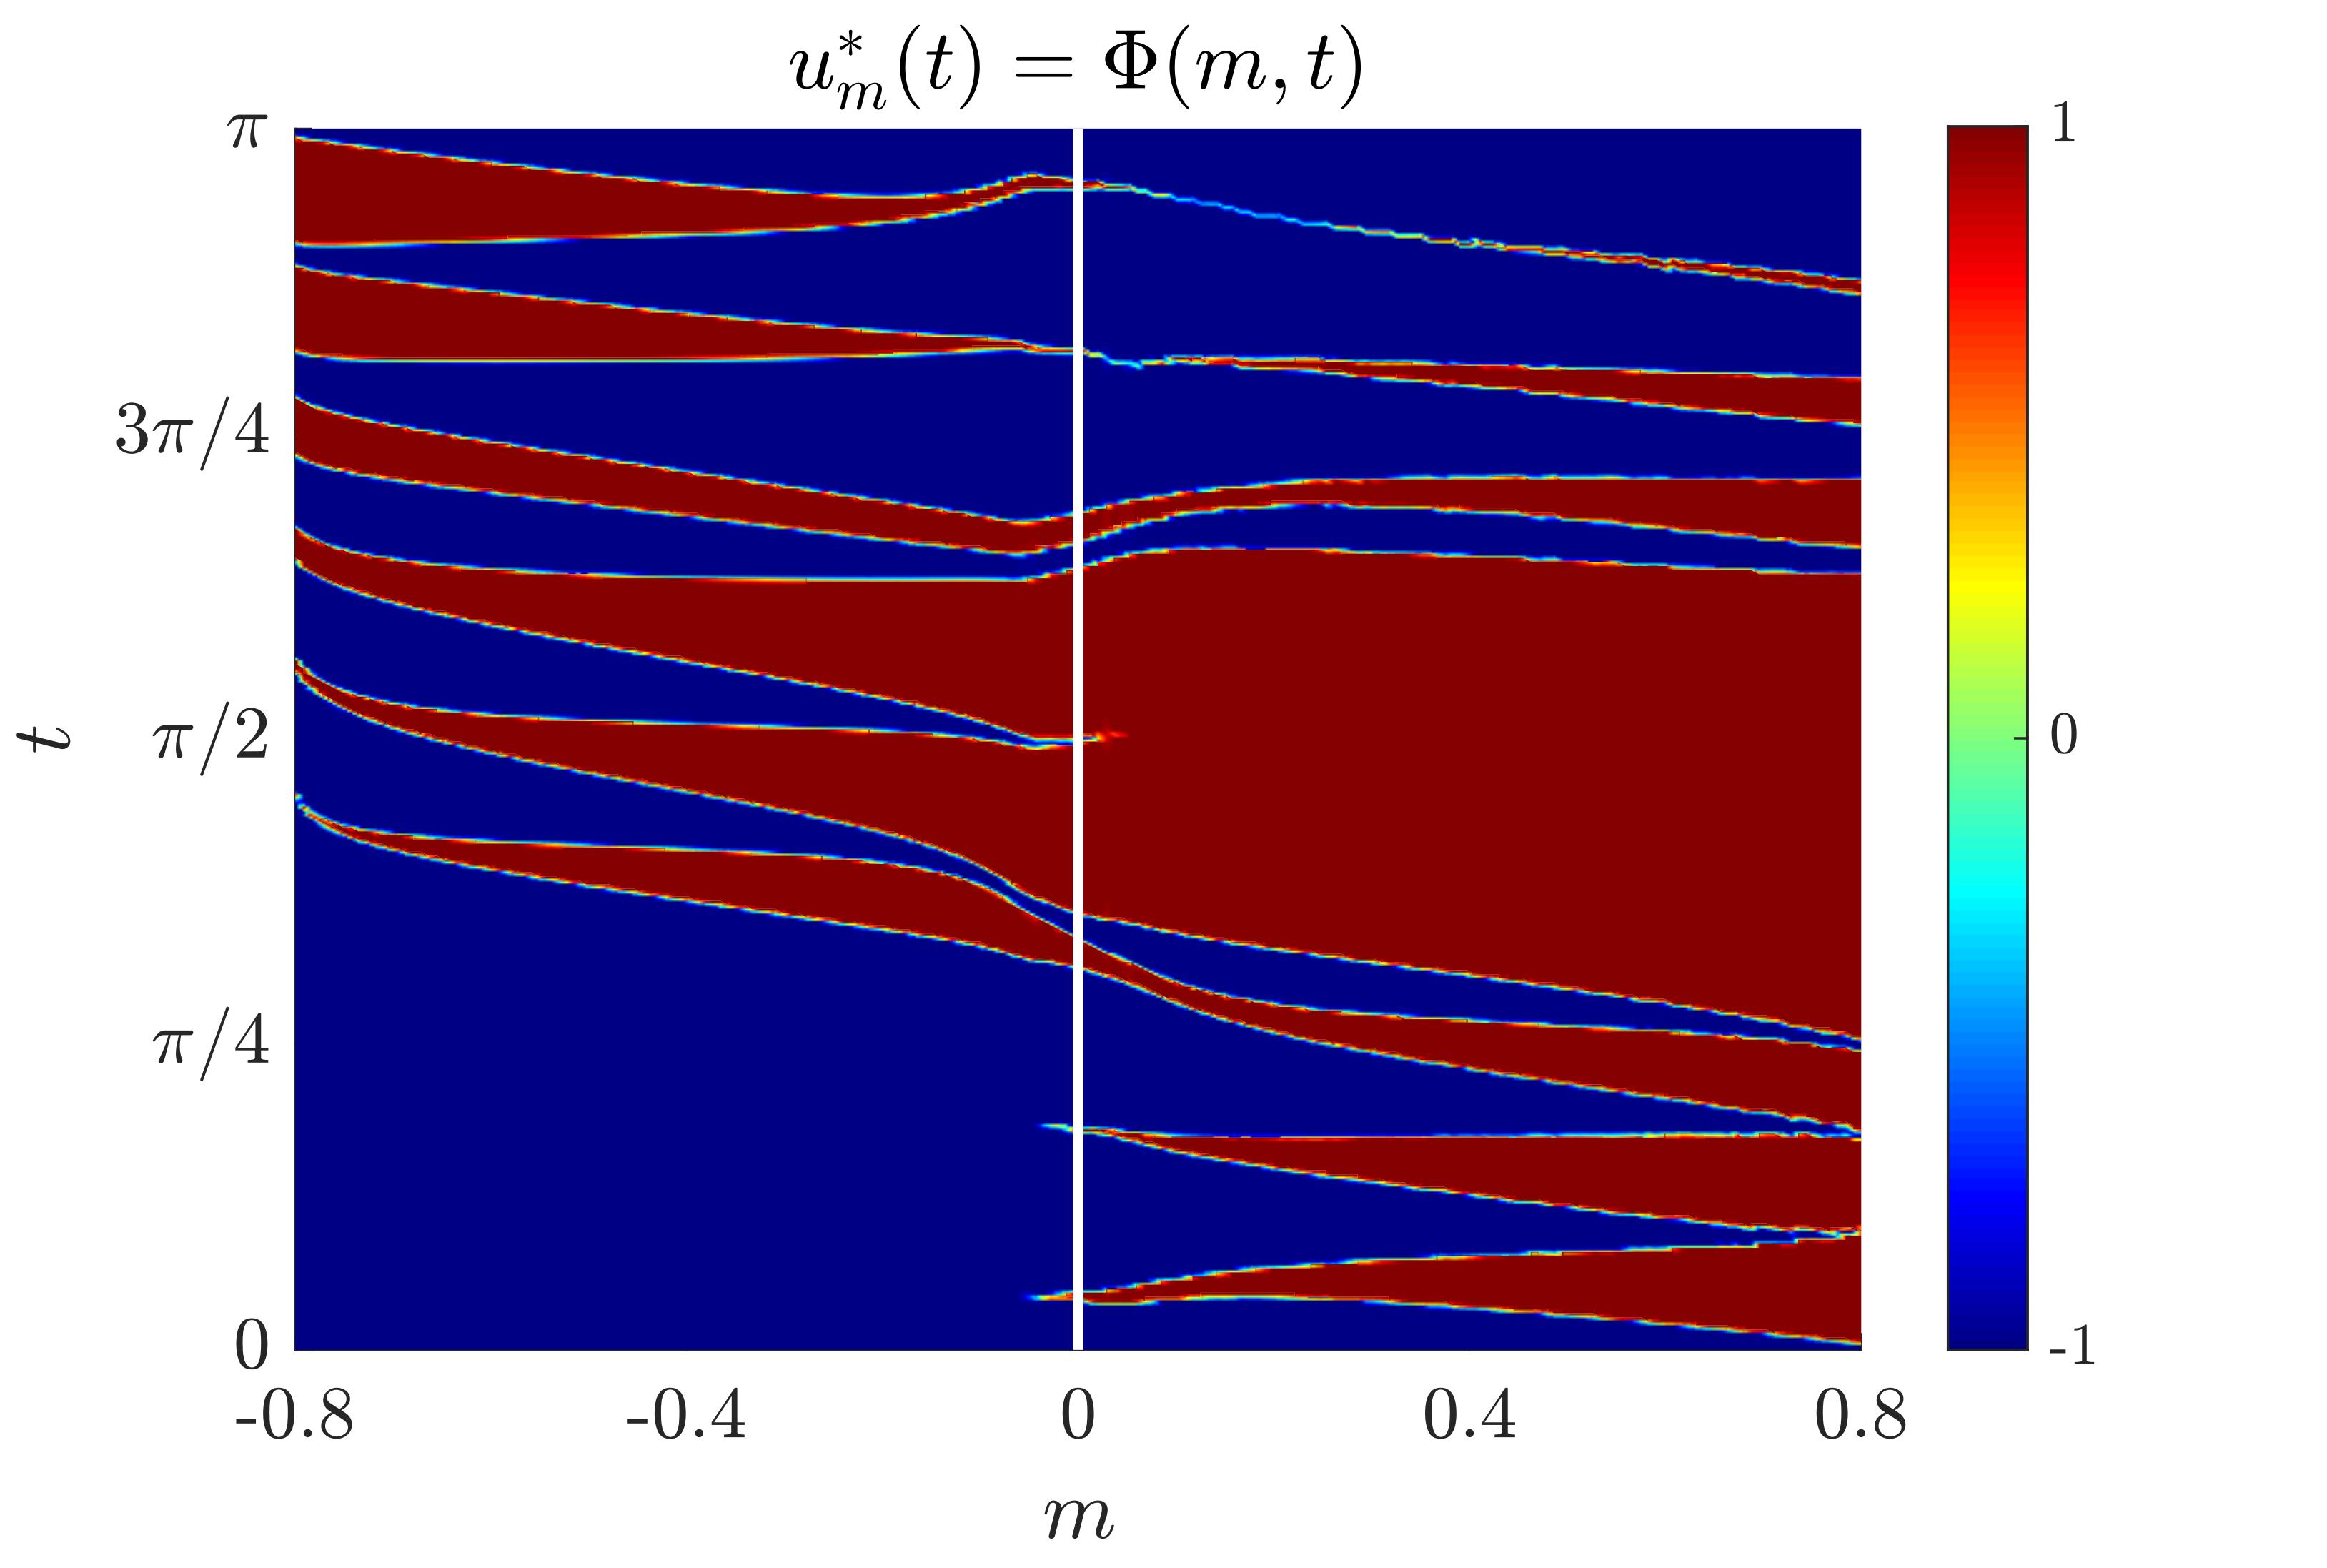 Figure 3. bang-bang control for the SHM problem